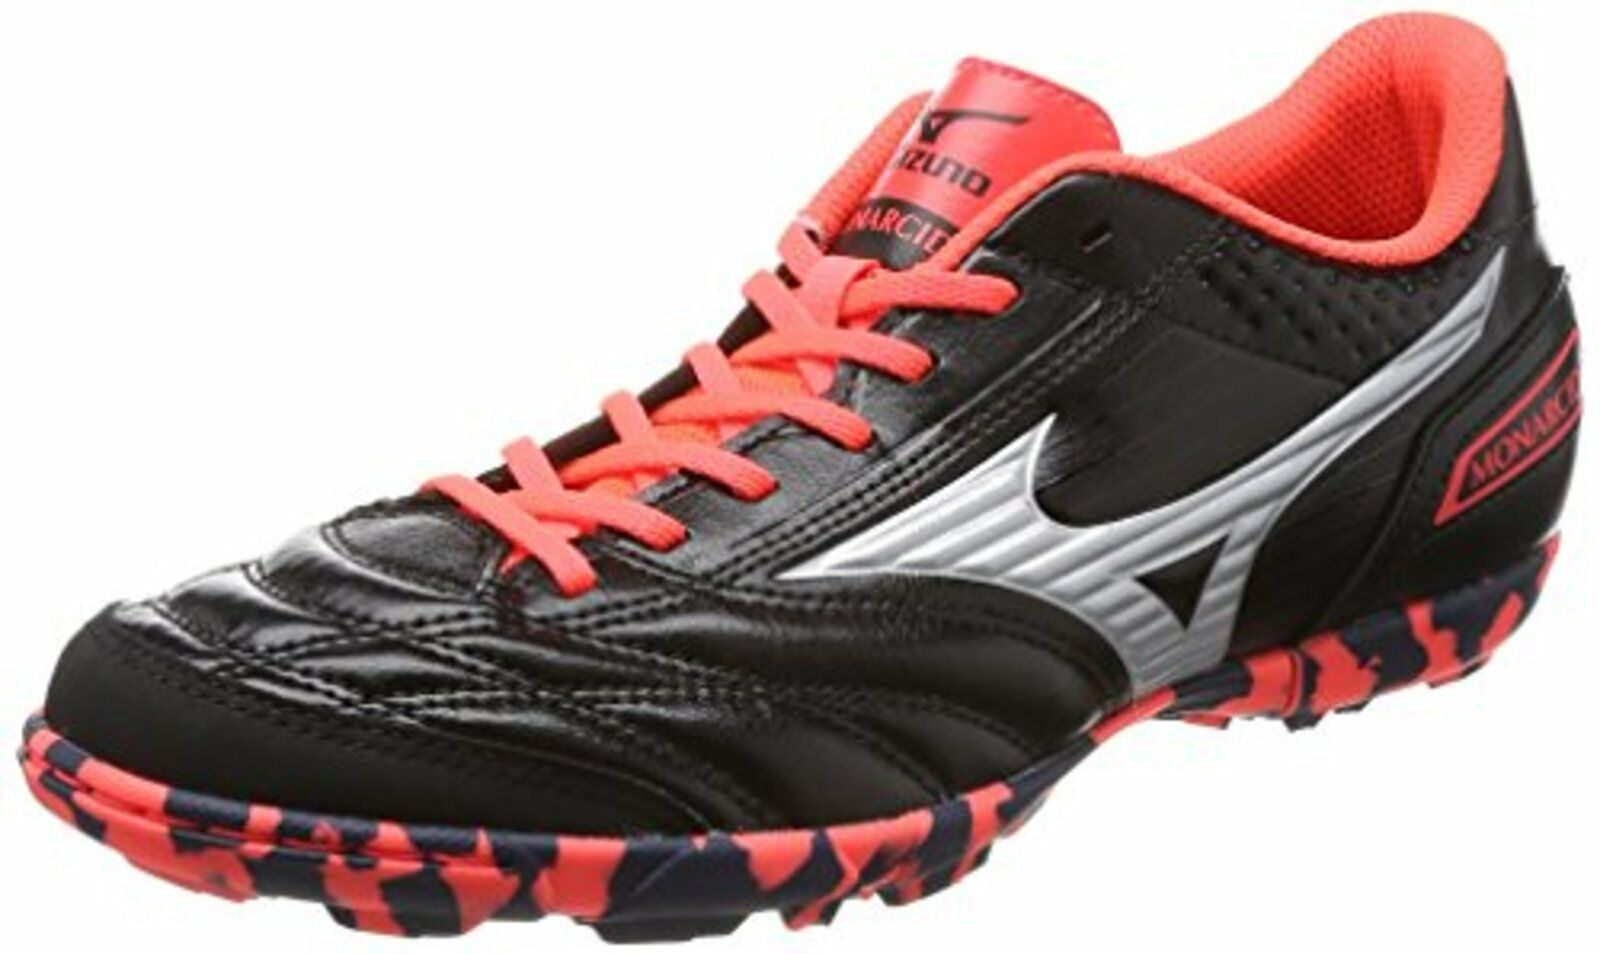 Mizuno Fútbol Zapatos Monarcida FS Tf Ancho Q1gb1712 Negro Us8 (26cm) Frontal